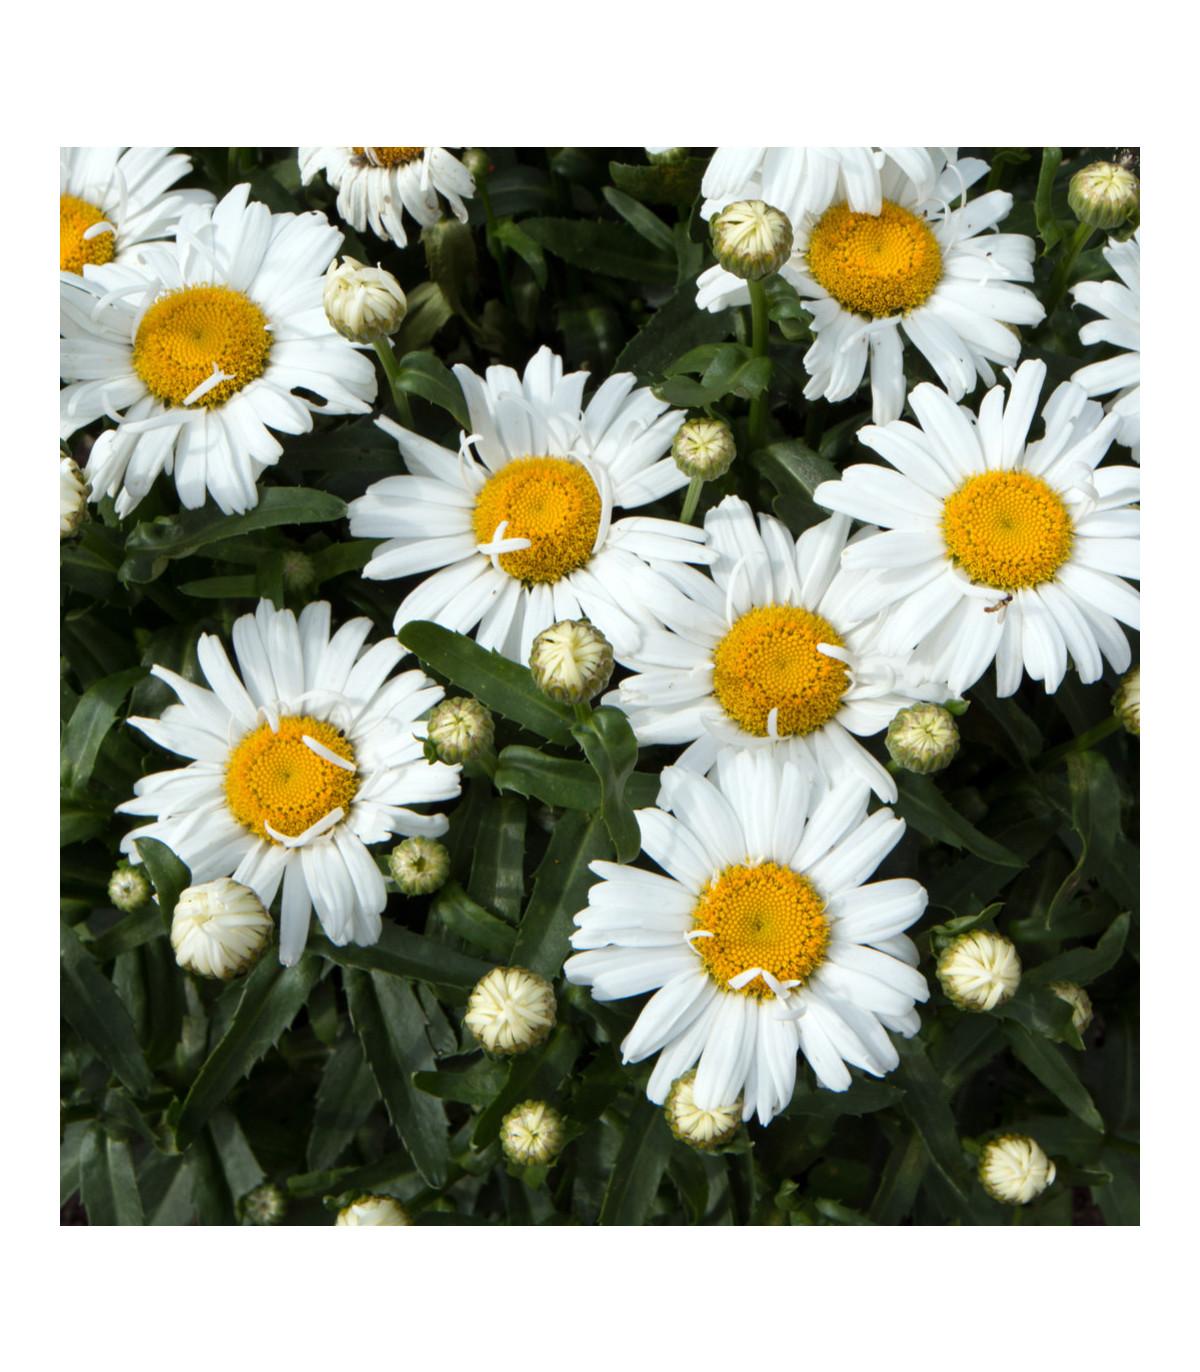 Margaréta biela Hviezda z Antverp - Chrysanthemum leucanthemum max. - semená - 0,4 g